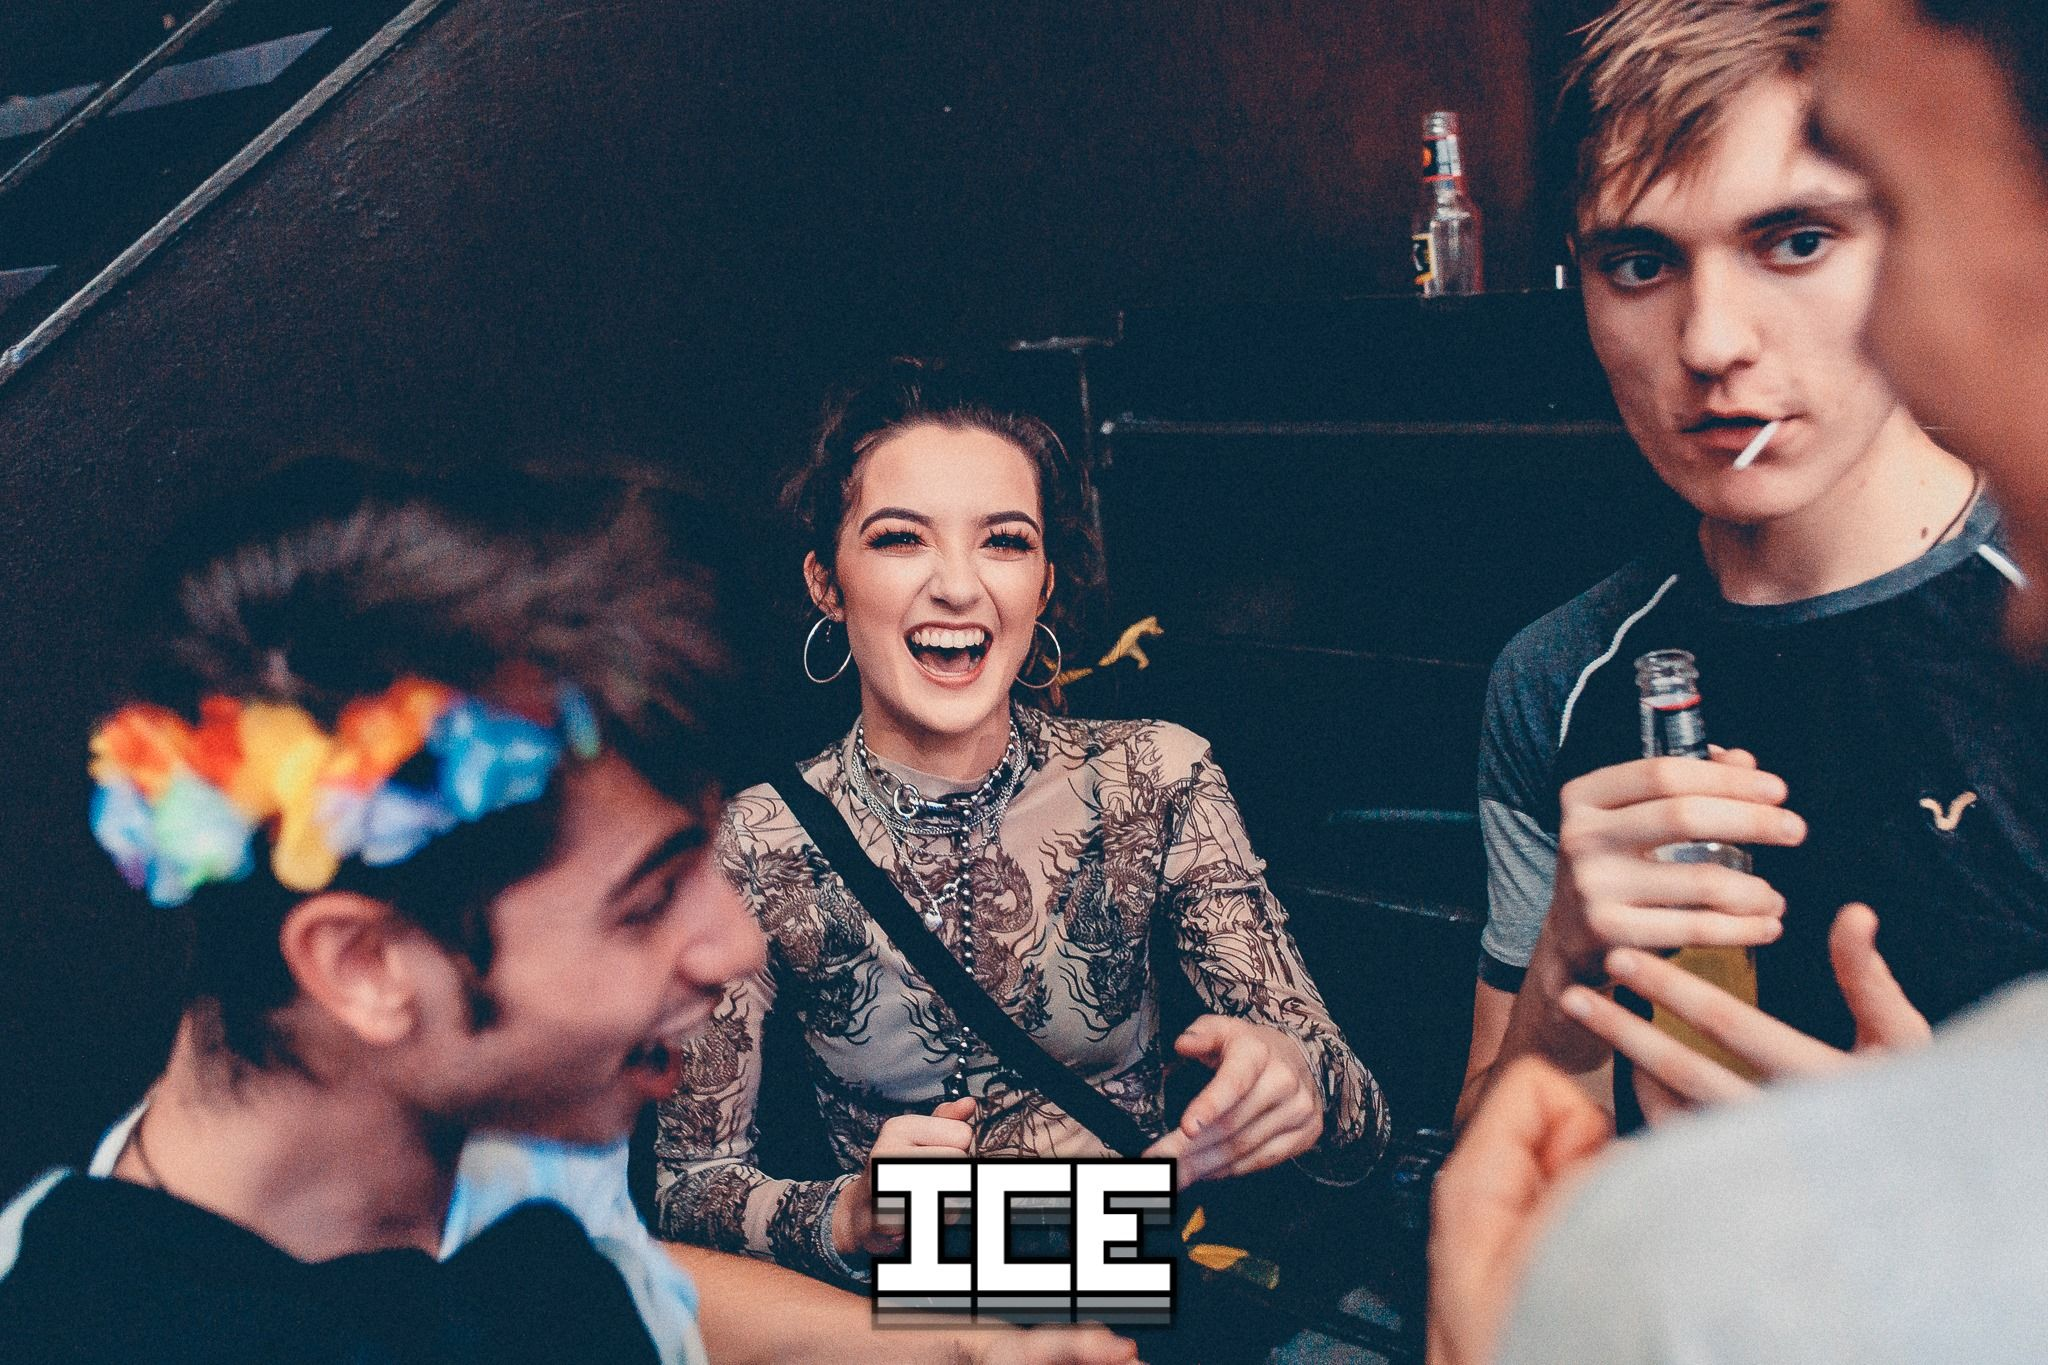 Image may contain: Bar Counter, Pub, Night Club, Club, Person, Human